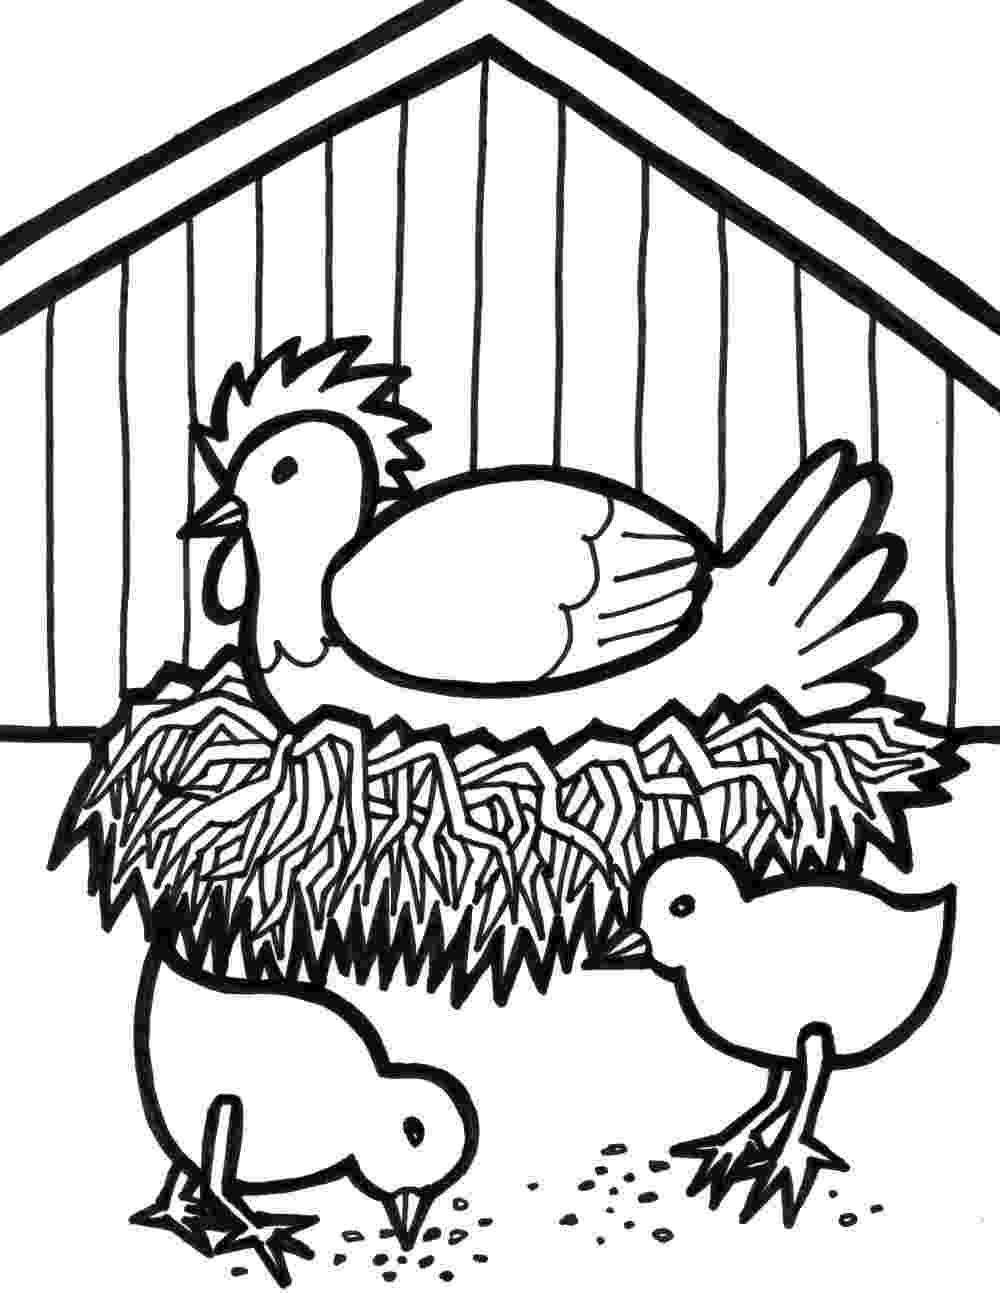 animal coloring pages printable free printable farm animal coloring pages for kids animal coloring pages printable